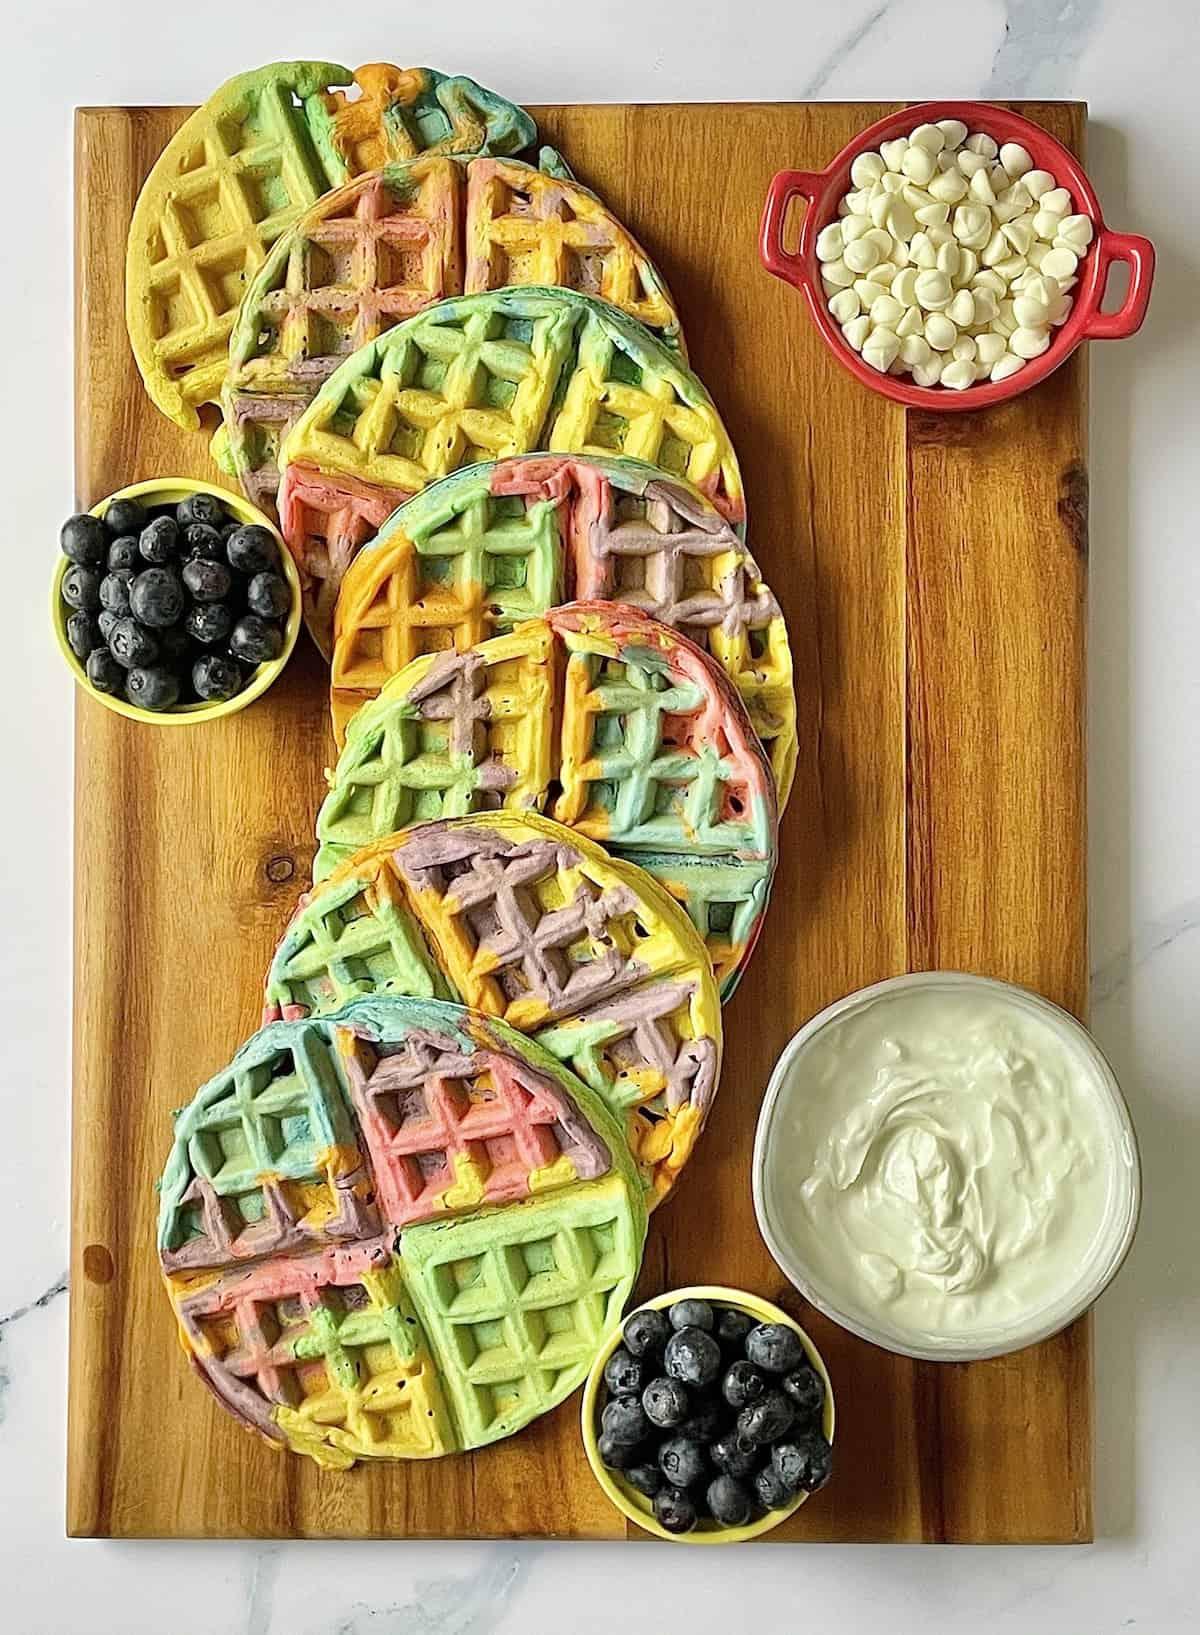 waffles, fruit, and yogurt on a charcuterie board